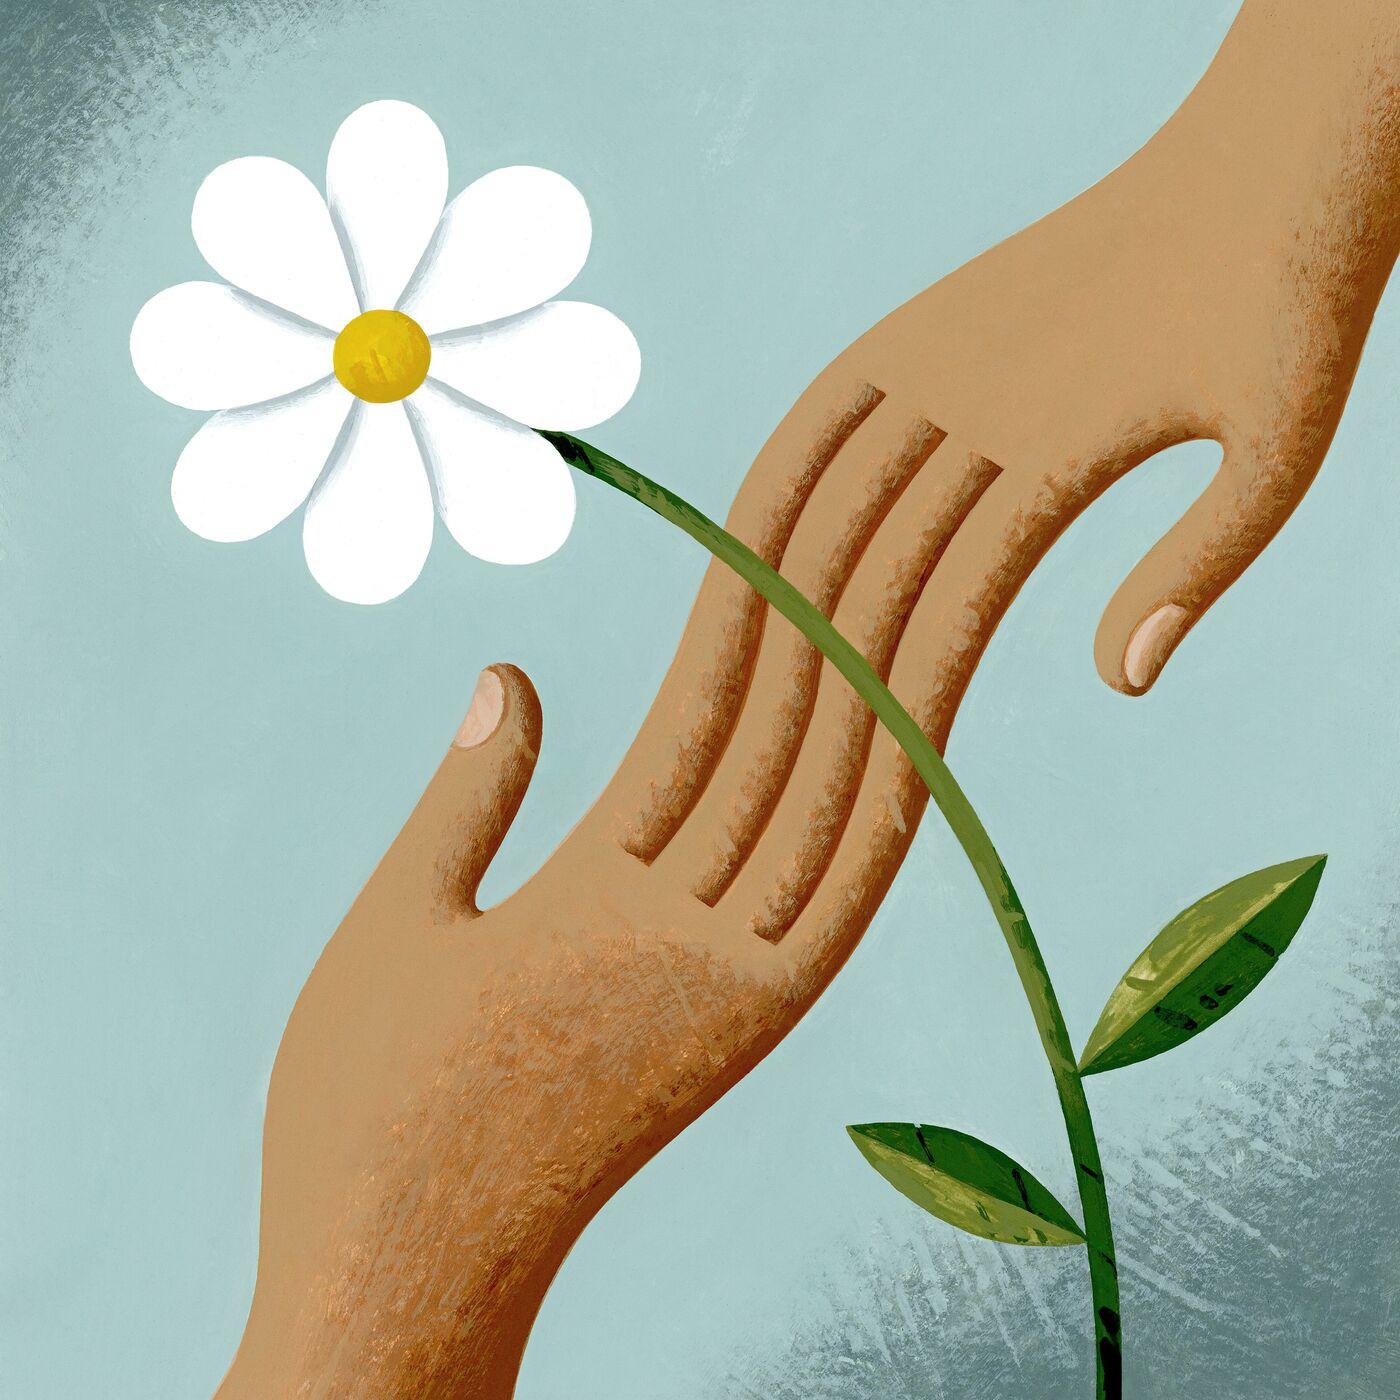 Tao Te Ching Verse 62: Giving the Tao